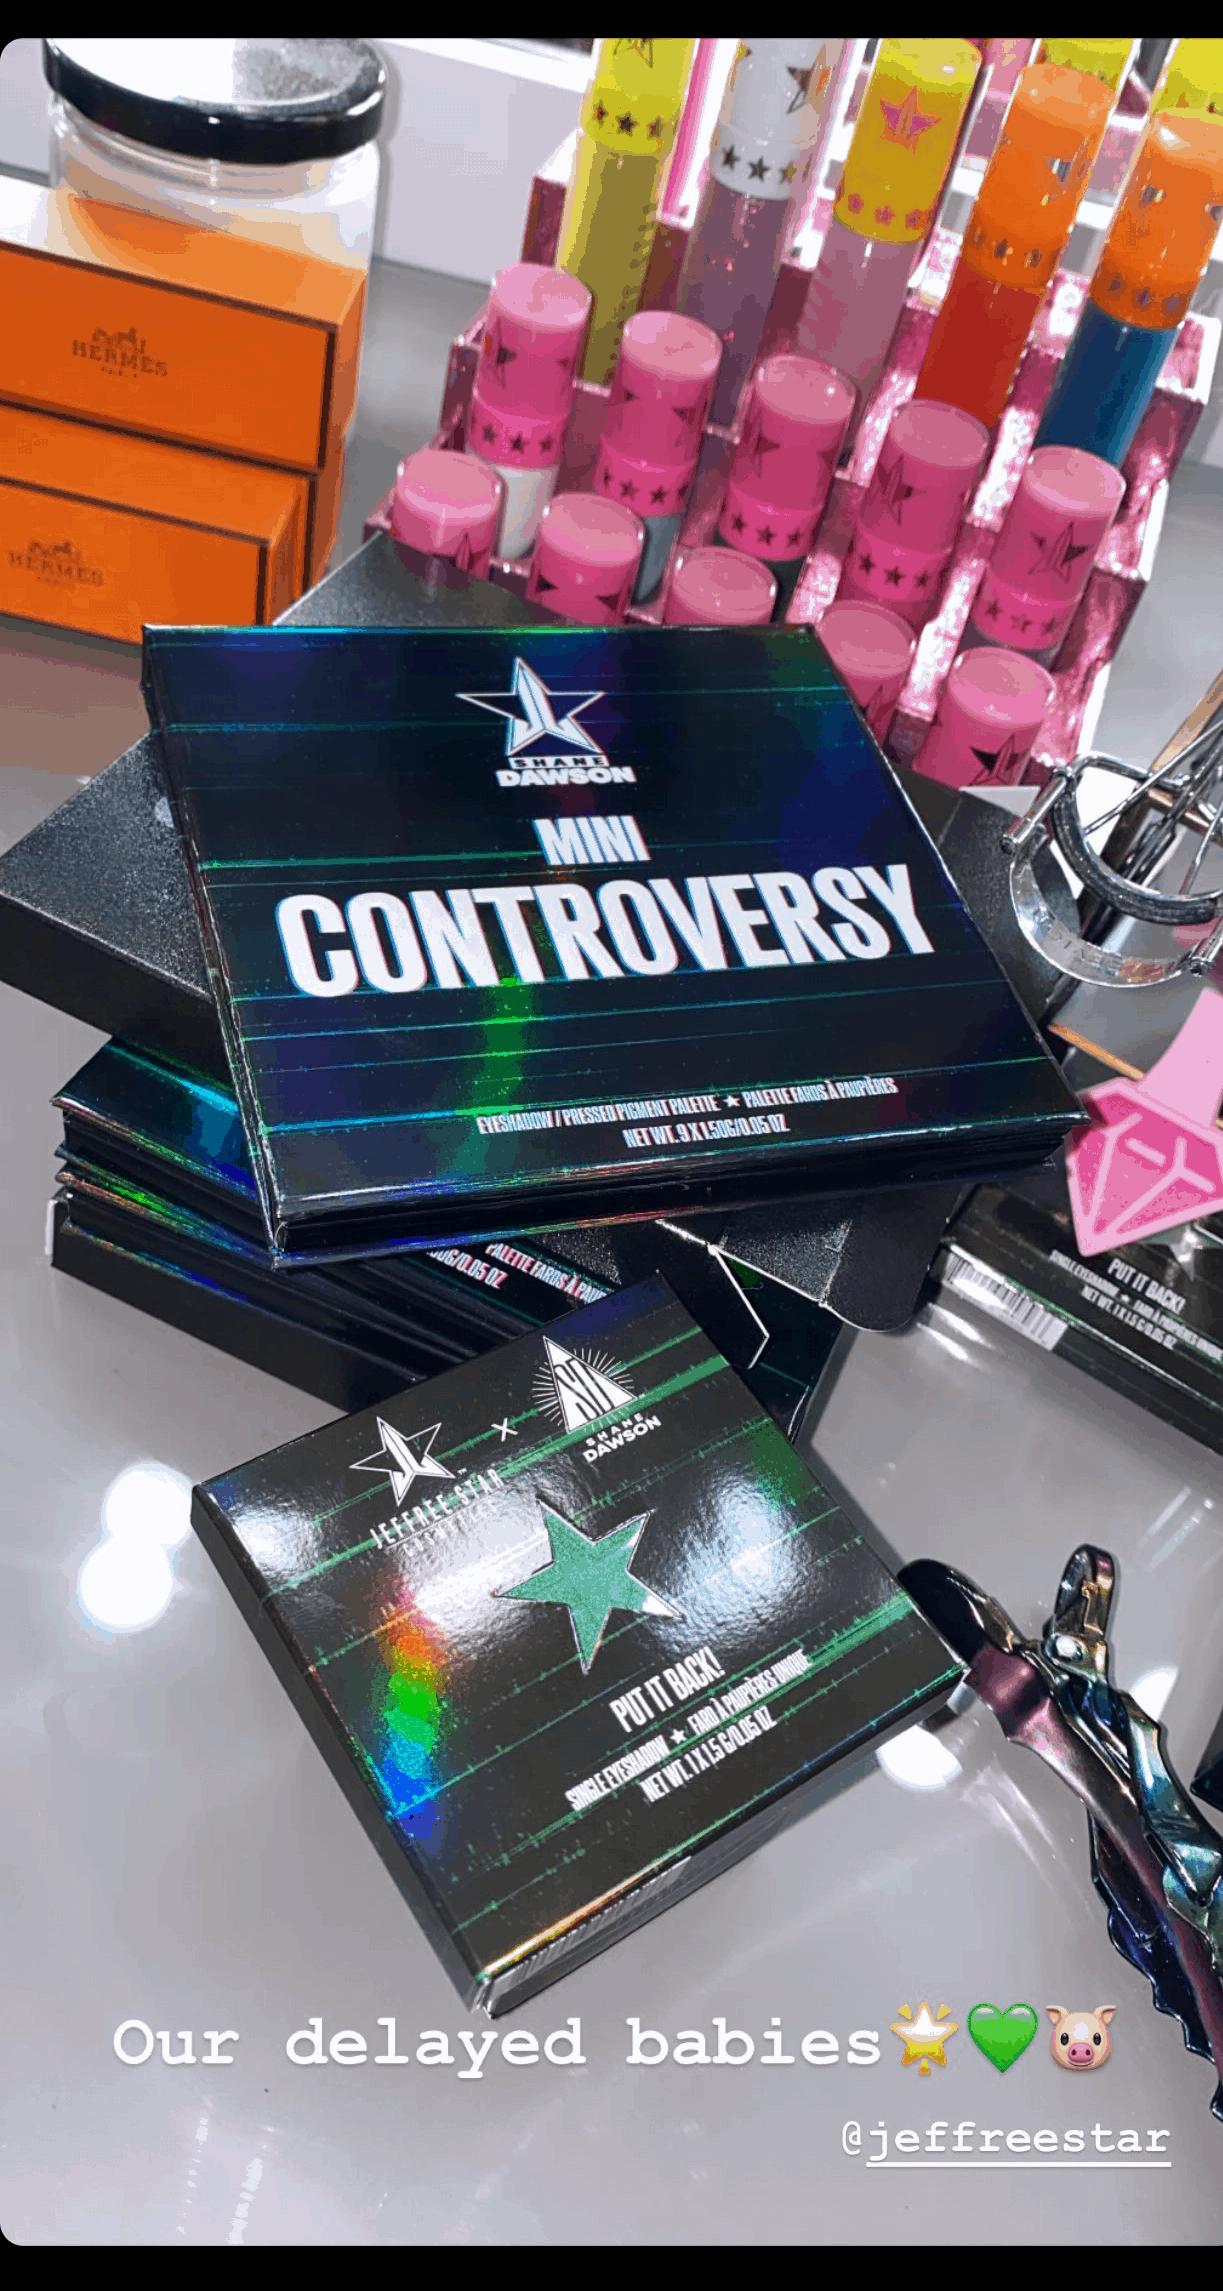 Jeffree Star Put It Back Palette | Jeffree Star Mini Controversy Palette